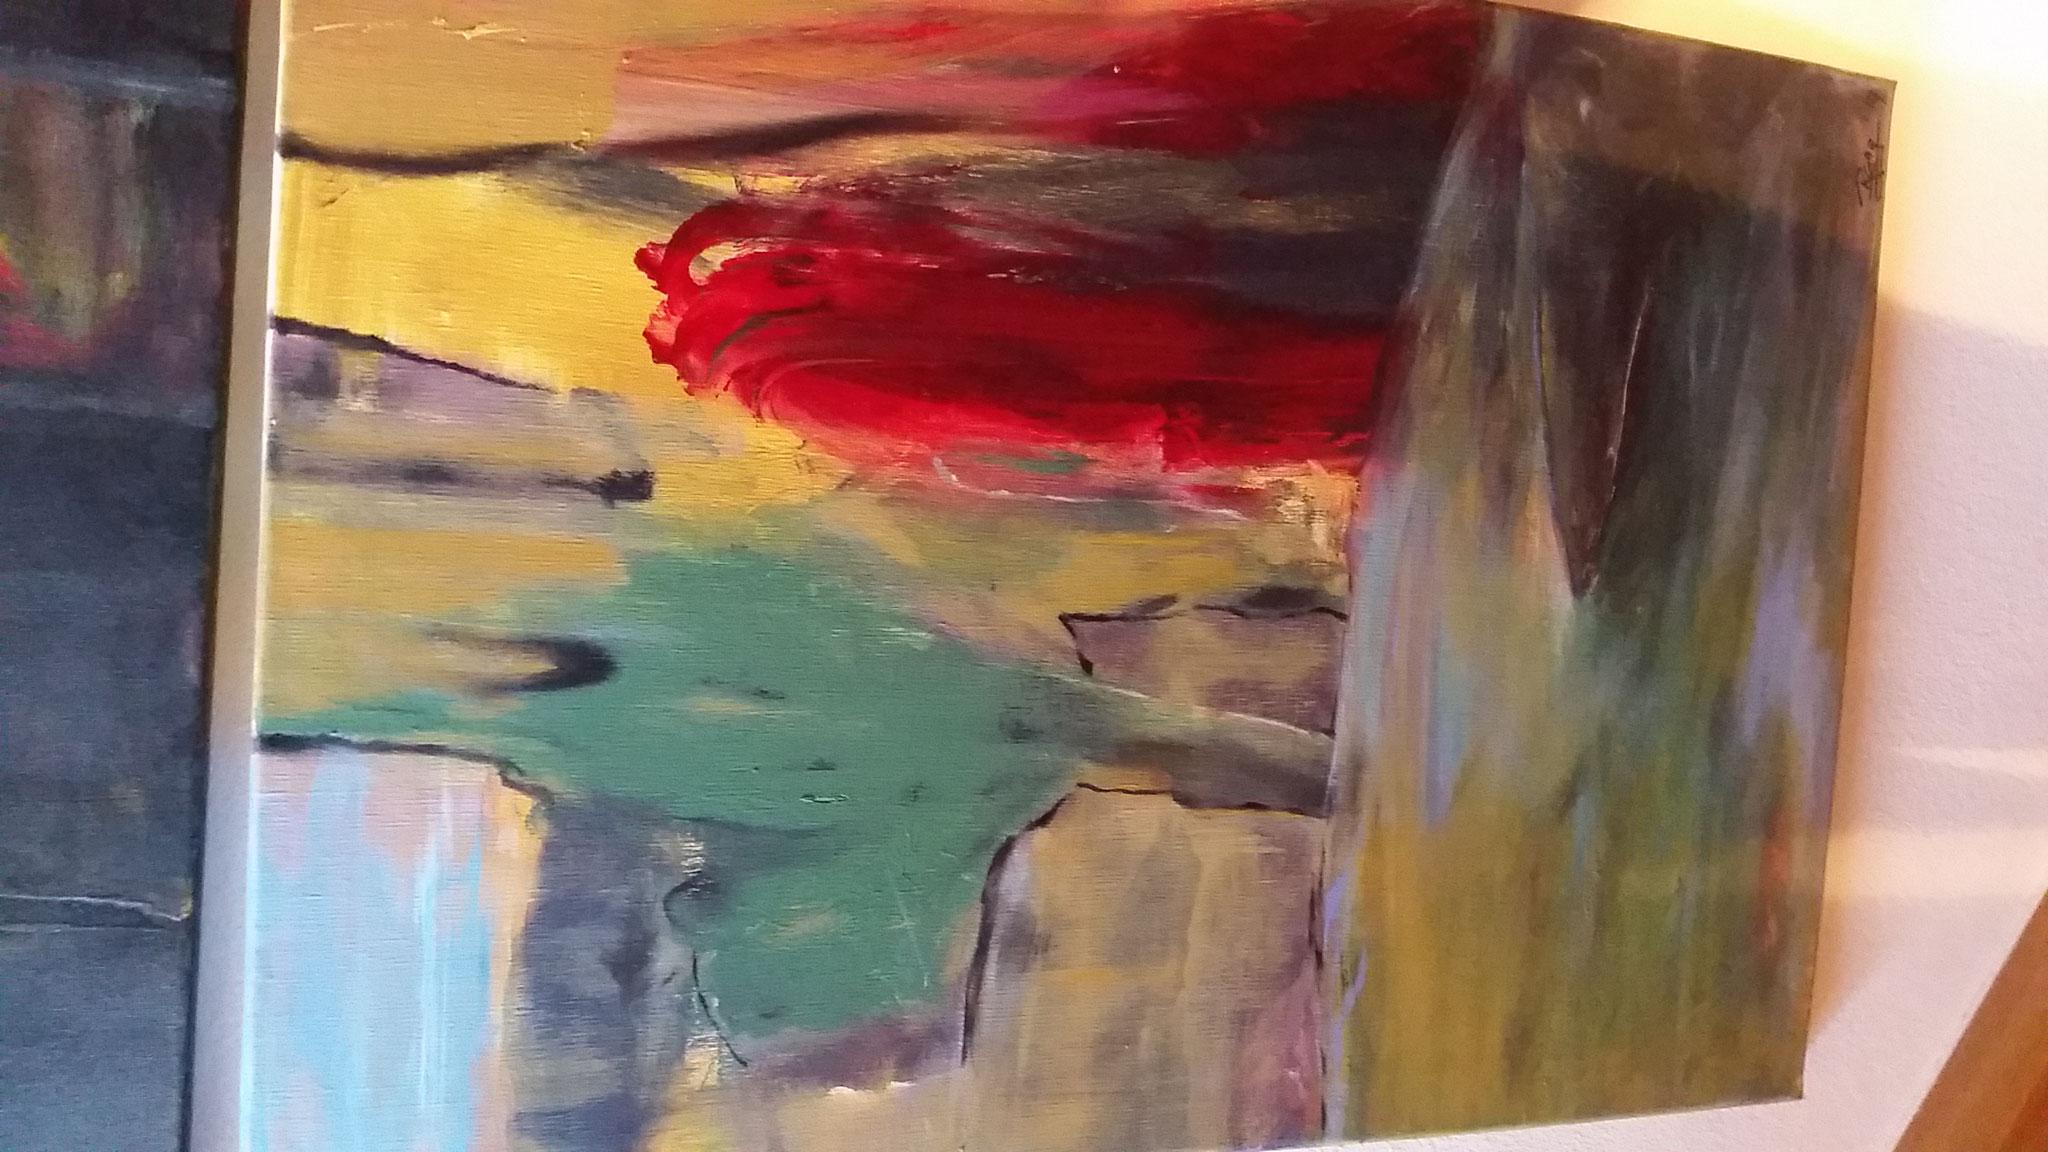 Treppen-Galerie 12, Maler Künstlerin Bozana